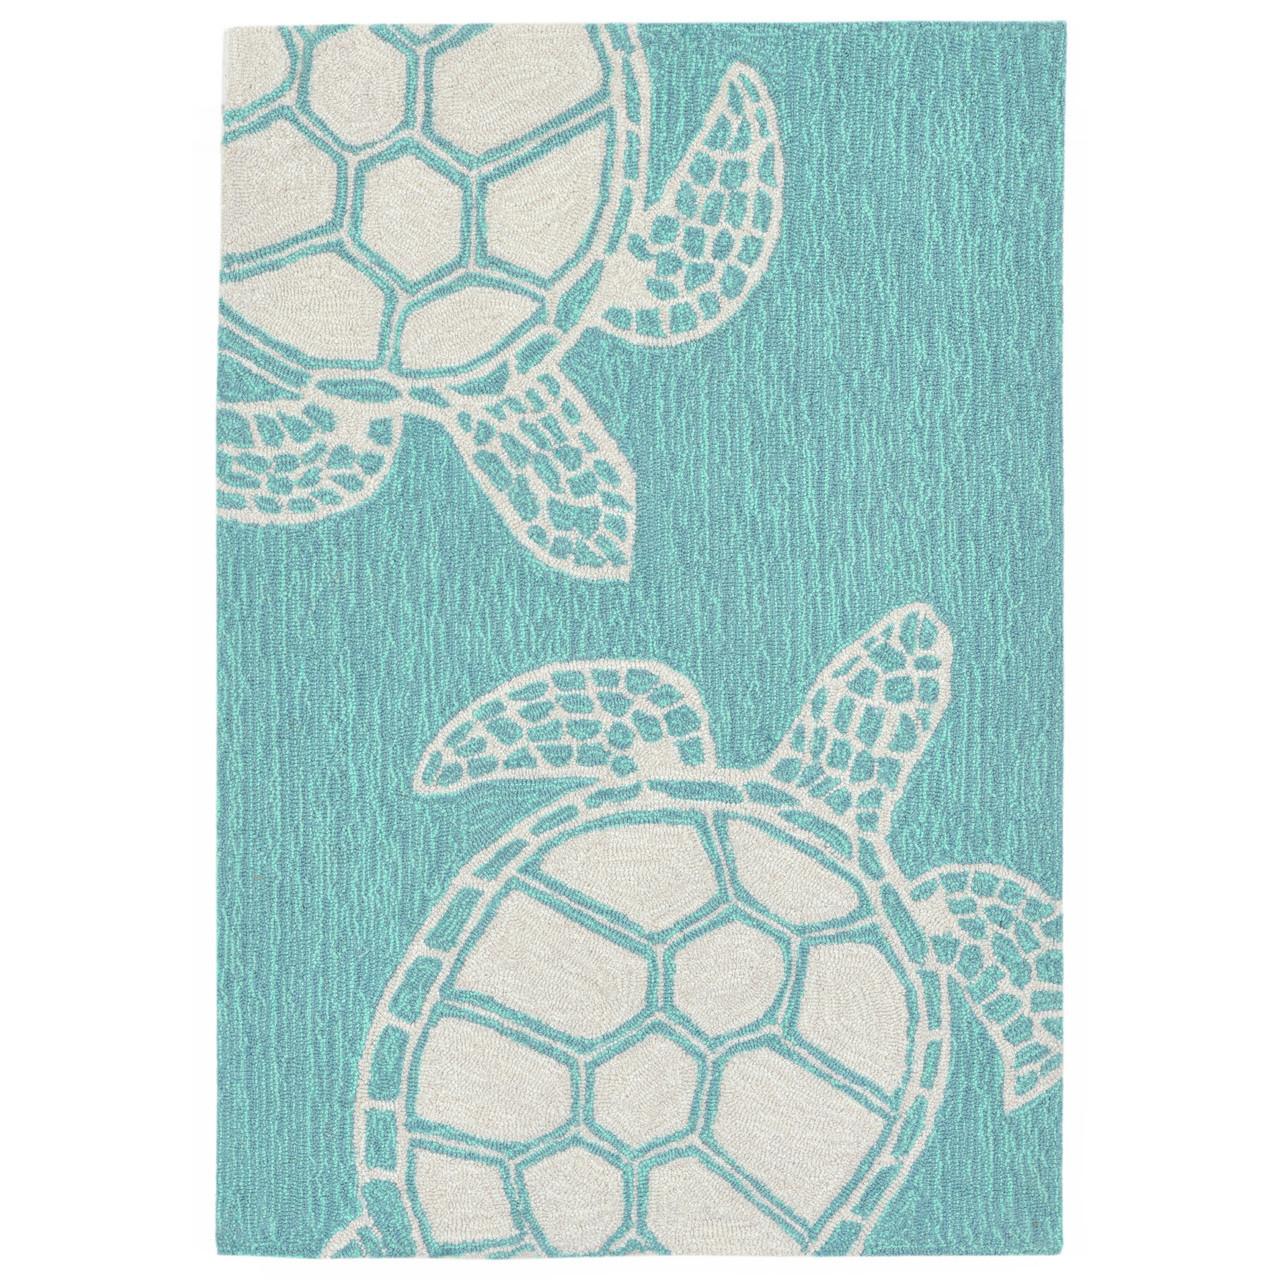 Turtle Key Sea Turtle Rug Blue Green 24 X 36 Indoor Outdoor Rug